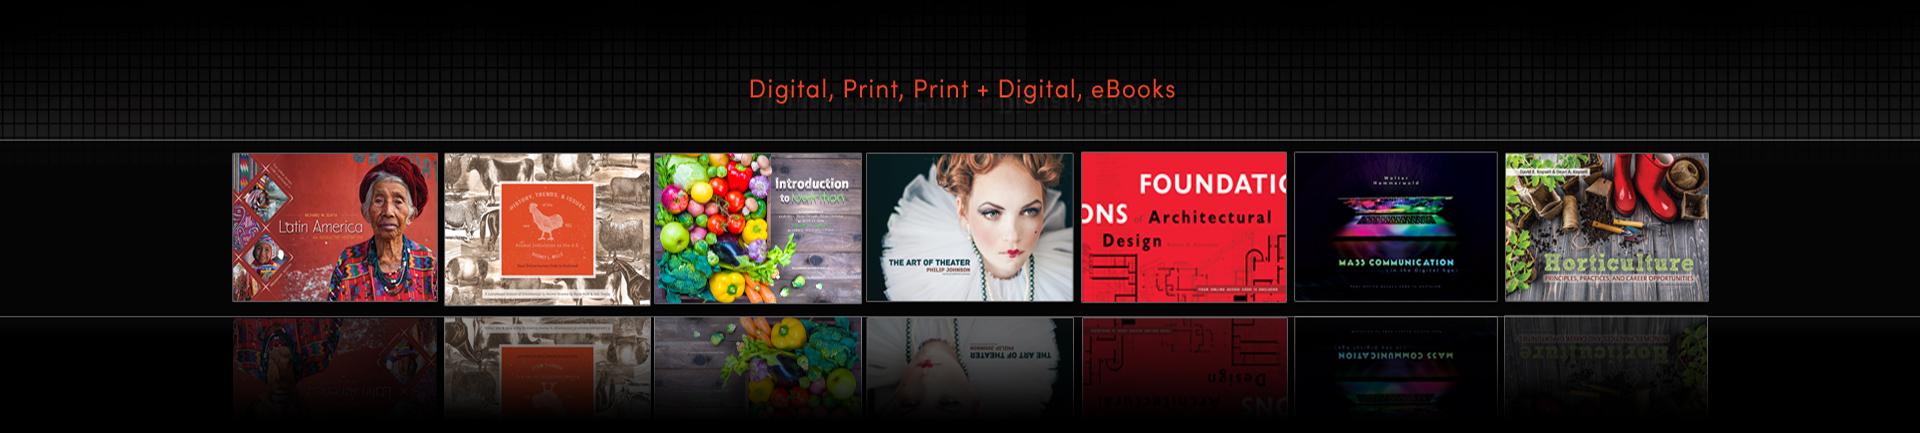 Access cards that GRL has made, digital, print, print and digital, Ebooks